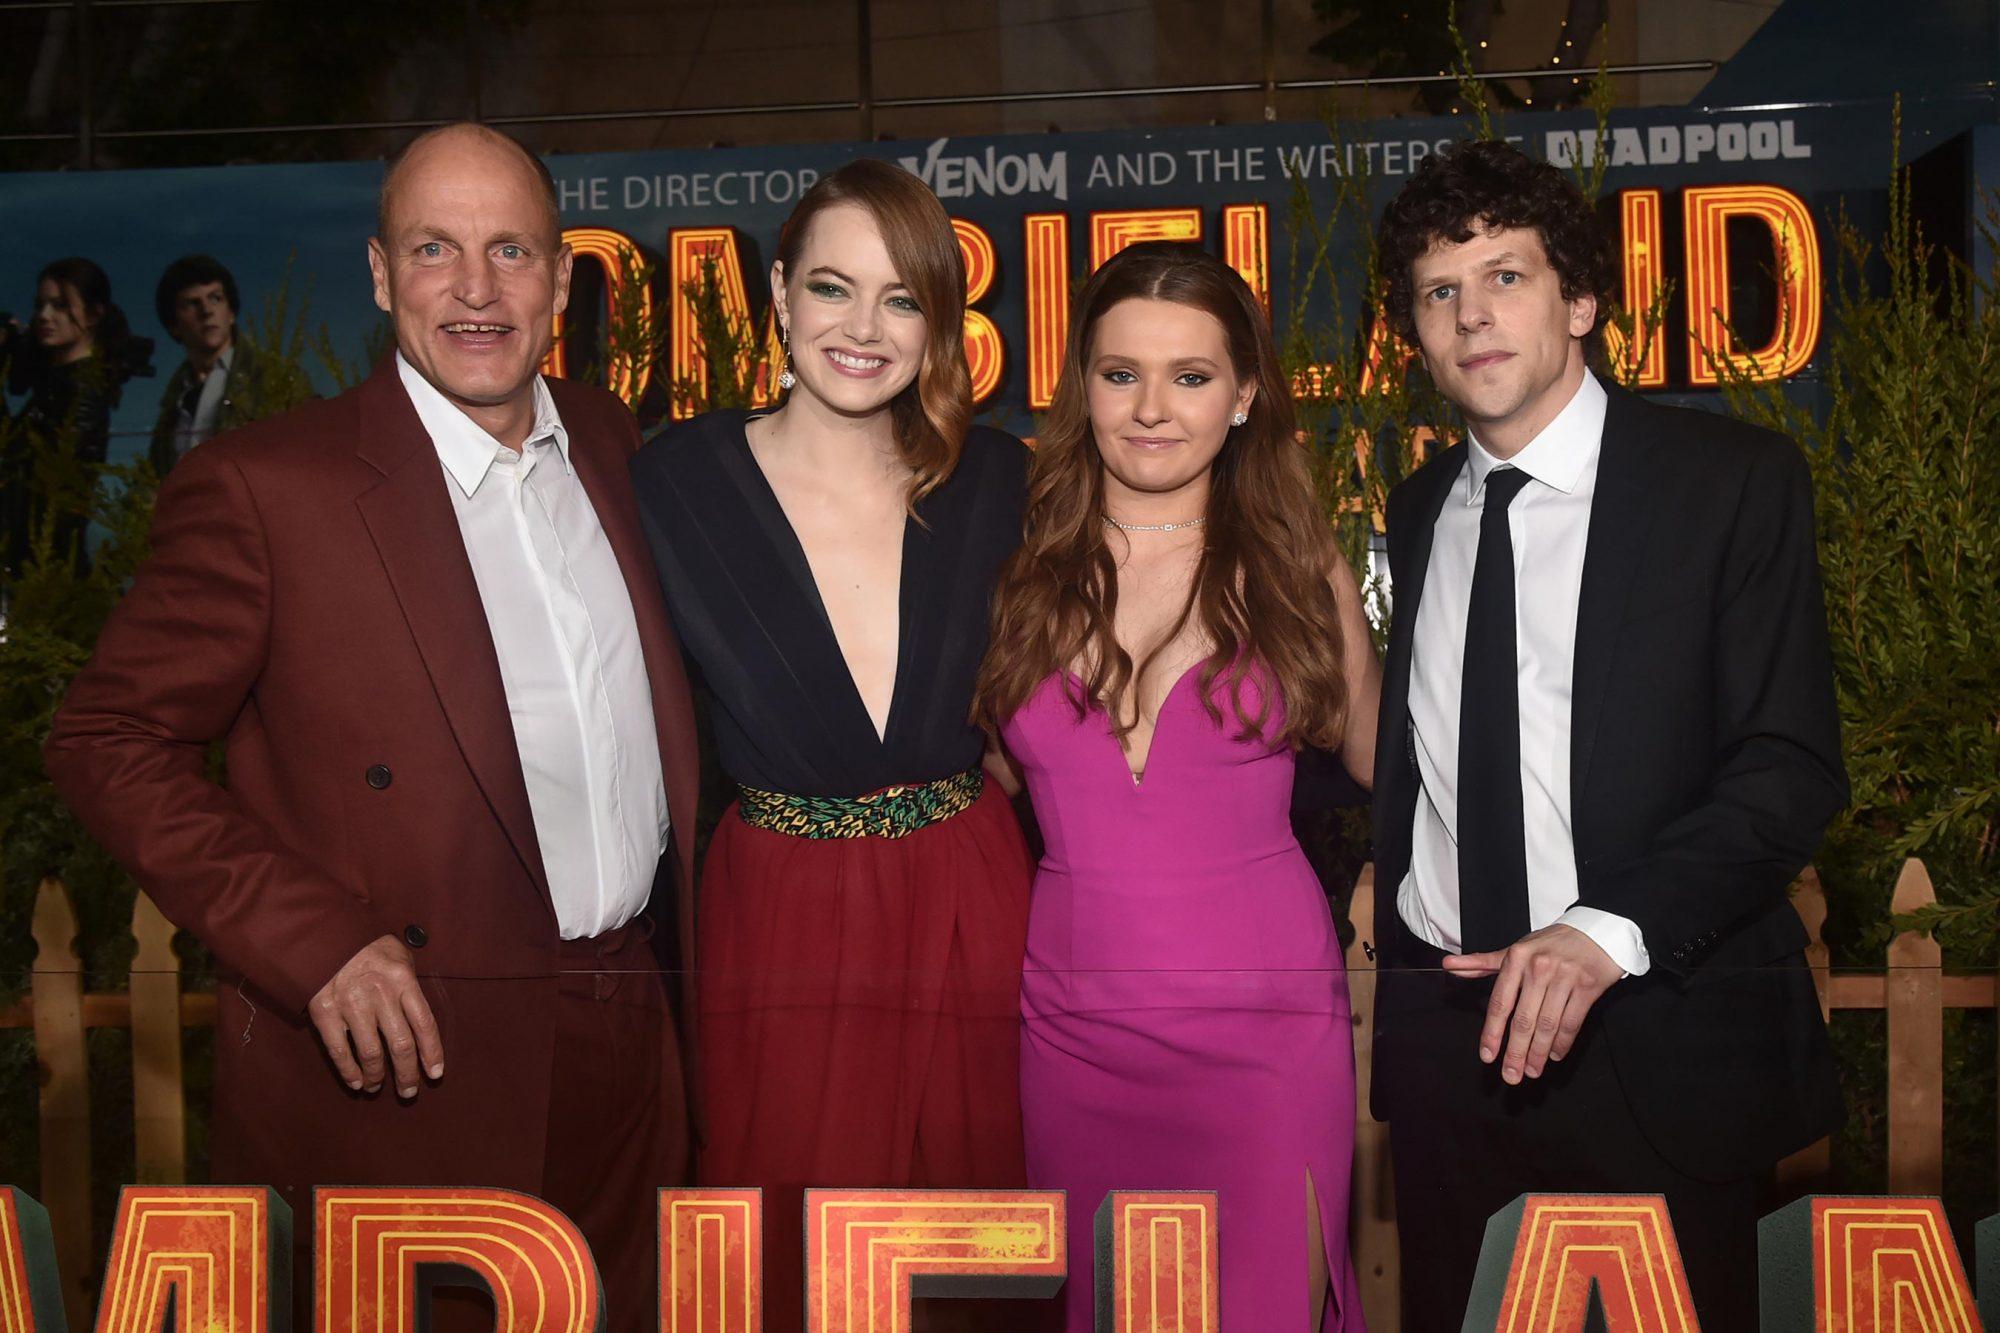 Woody Harrelson, Emma Stone, Abigail Breslin and Jesse Eisenberg